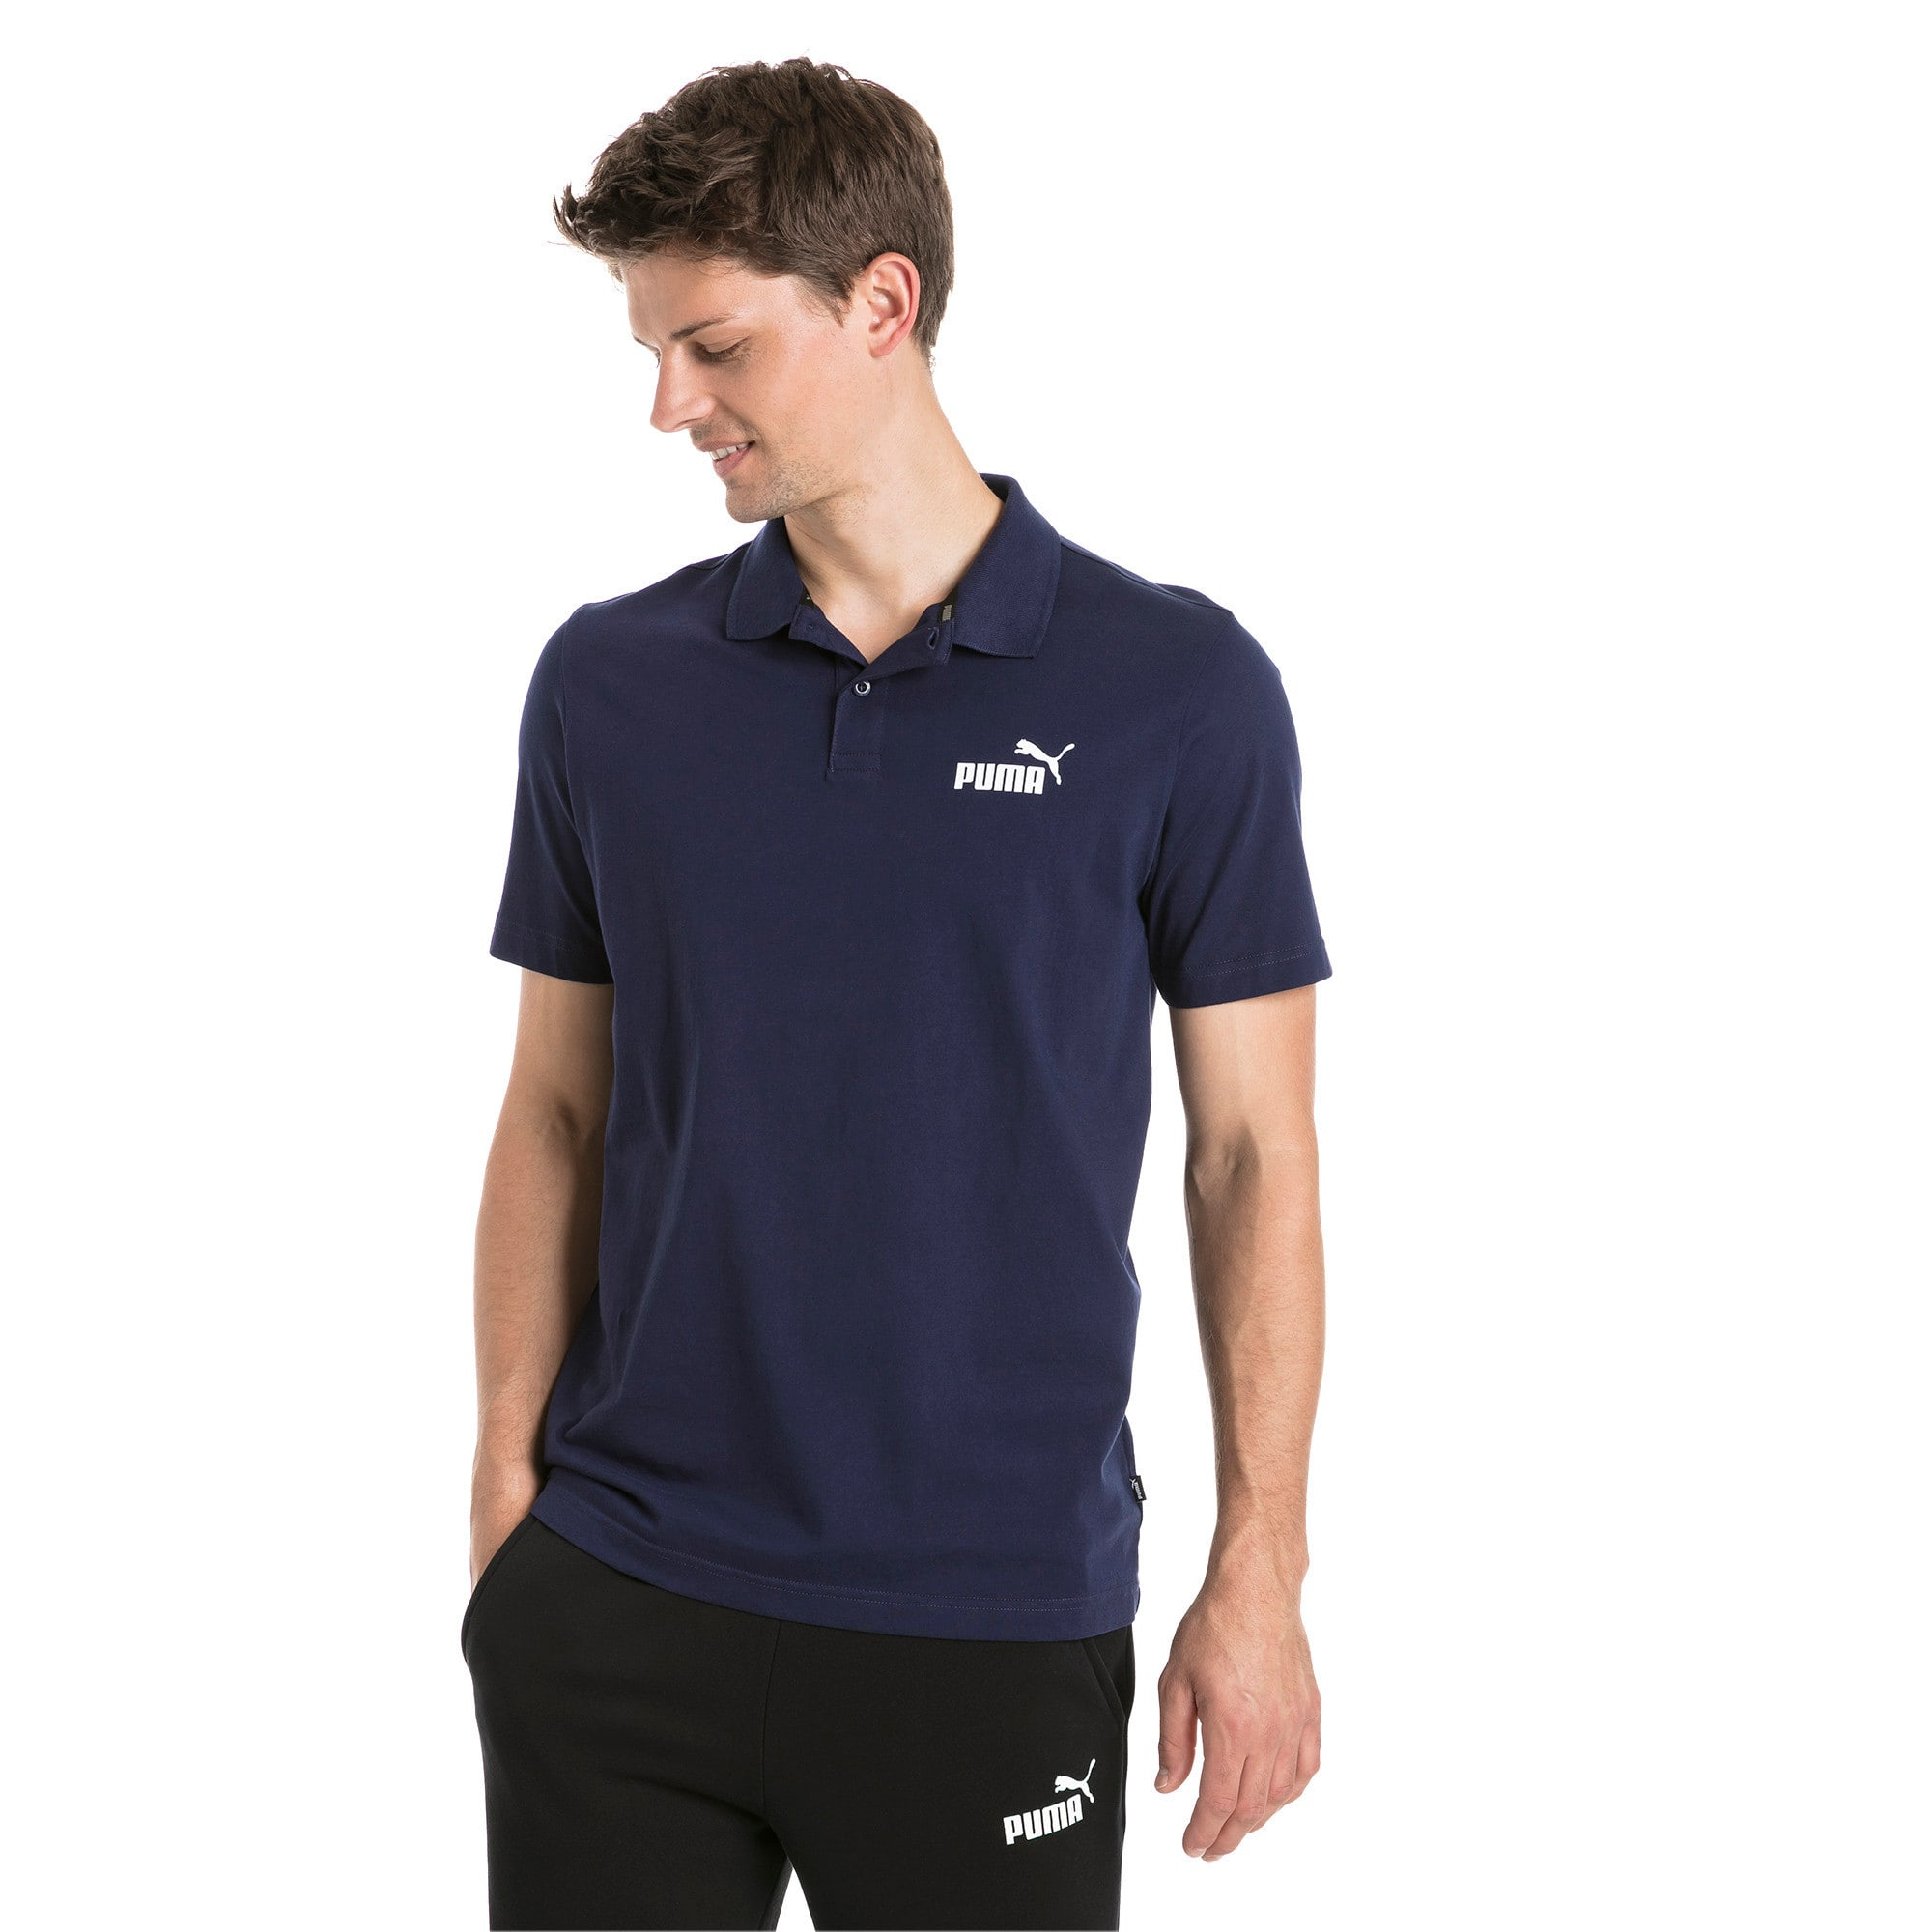 Thumbnail 1 of Polo in jersey Essentials uomo, Peacoat, medium